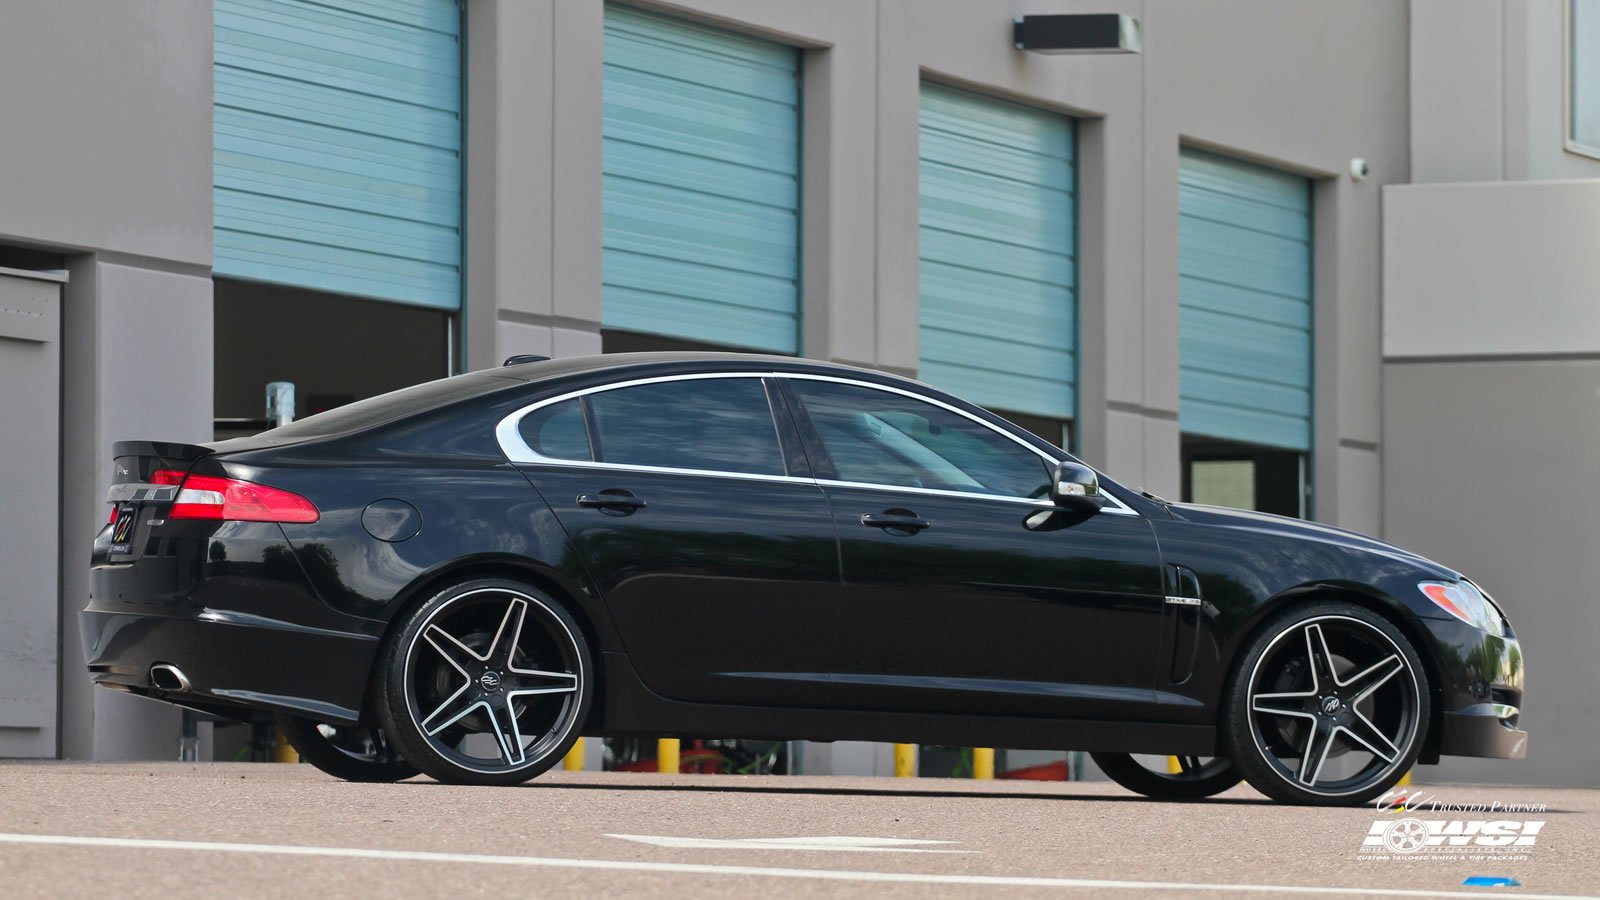 2015 cars cec jaguar xf sedan tuning wheels wallpaper 1600x900 625514 wallpaperup. Black Bedroom Furniture Sets. Home Design Ideas